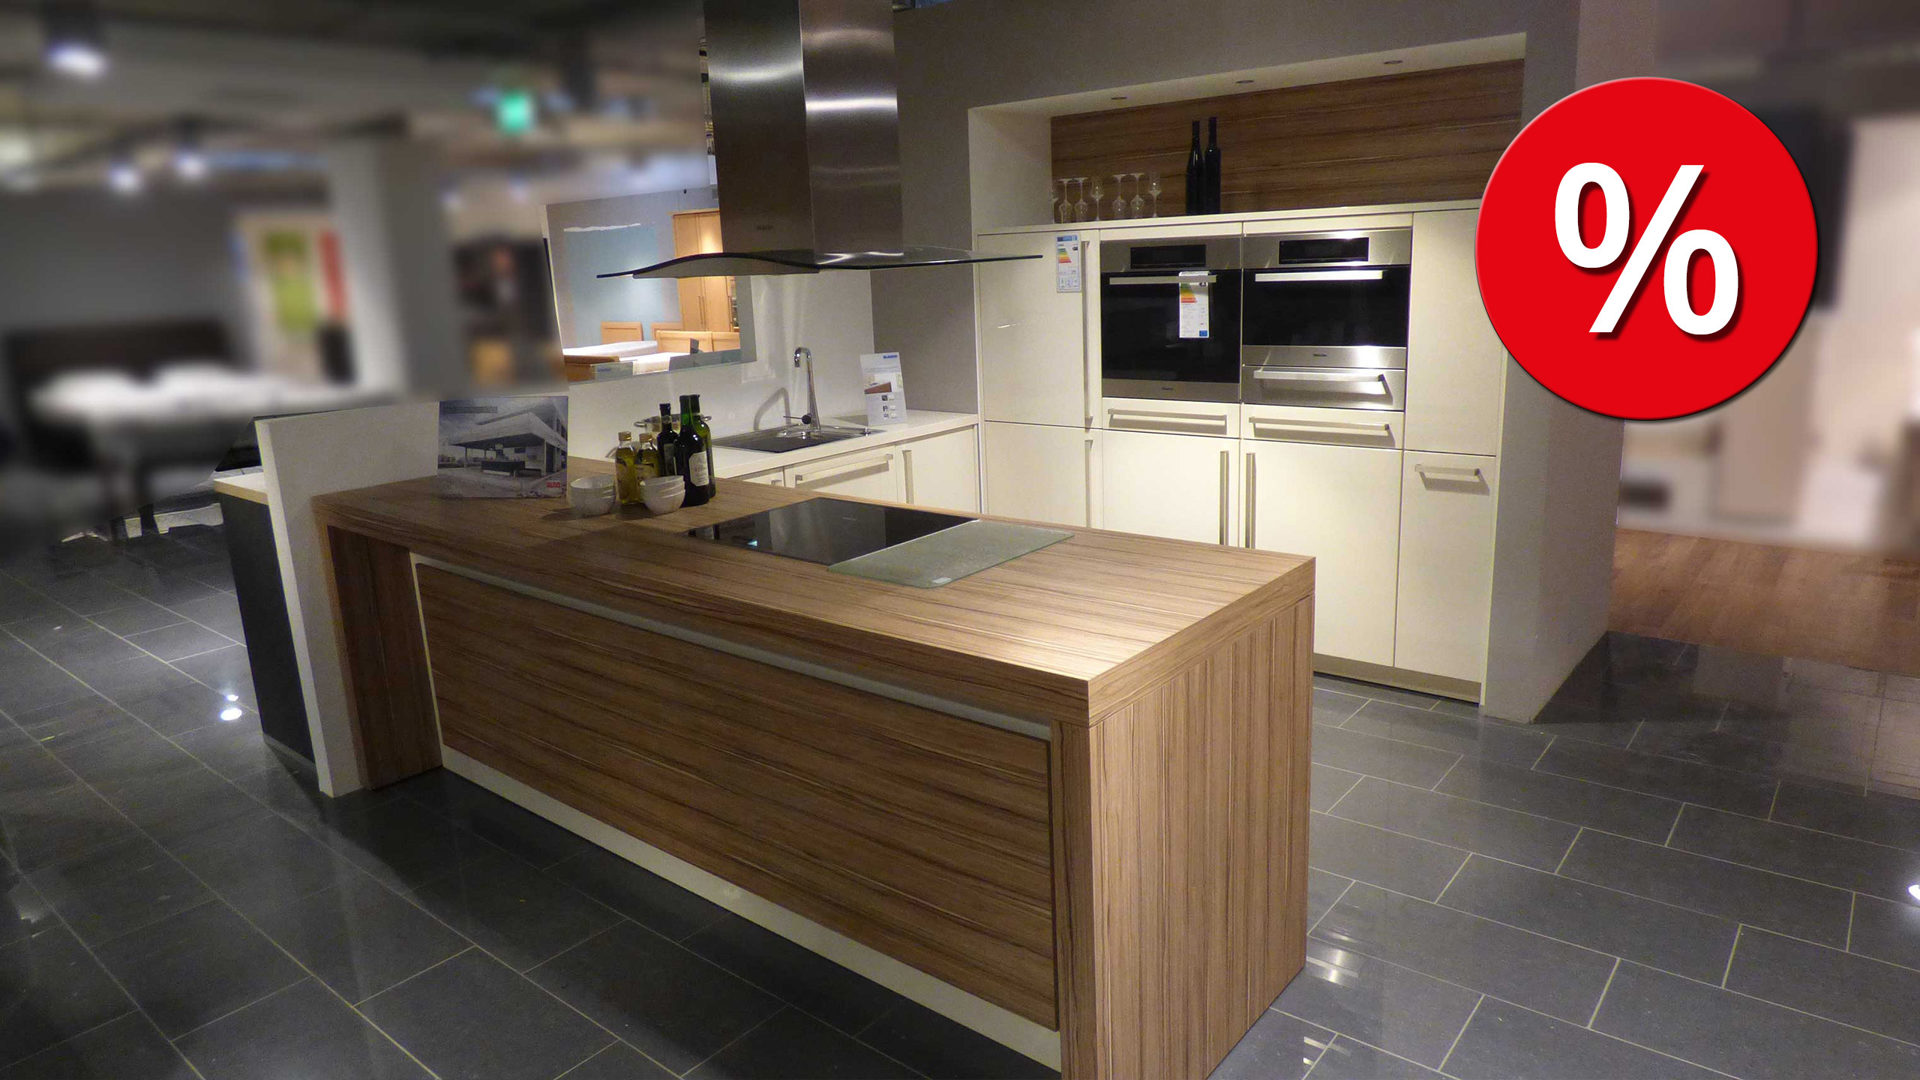 ALNO Küche Einbauküche ALNOSIGN inkl. Miele E-Geräte und ...